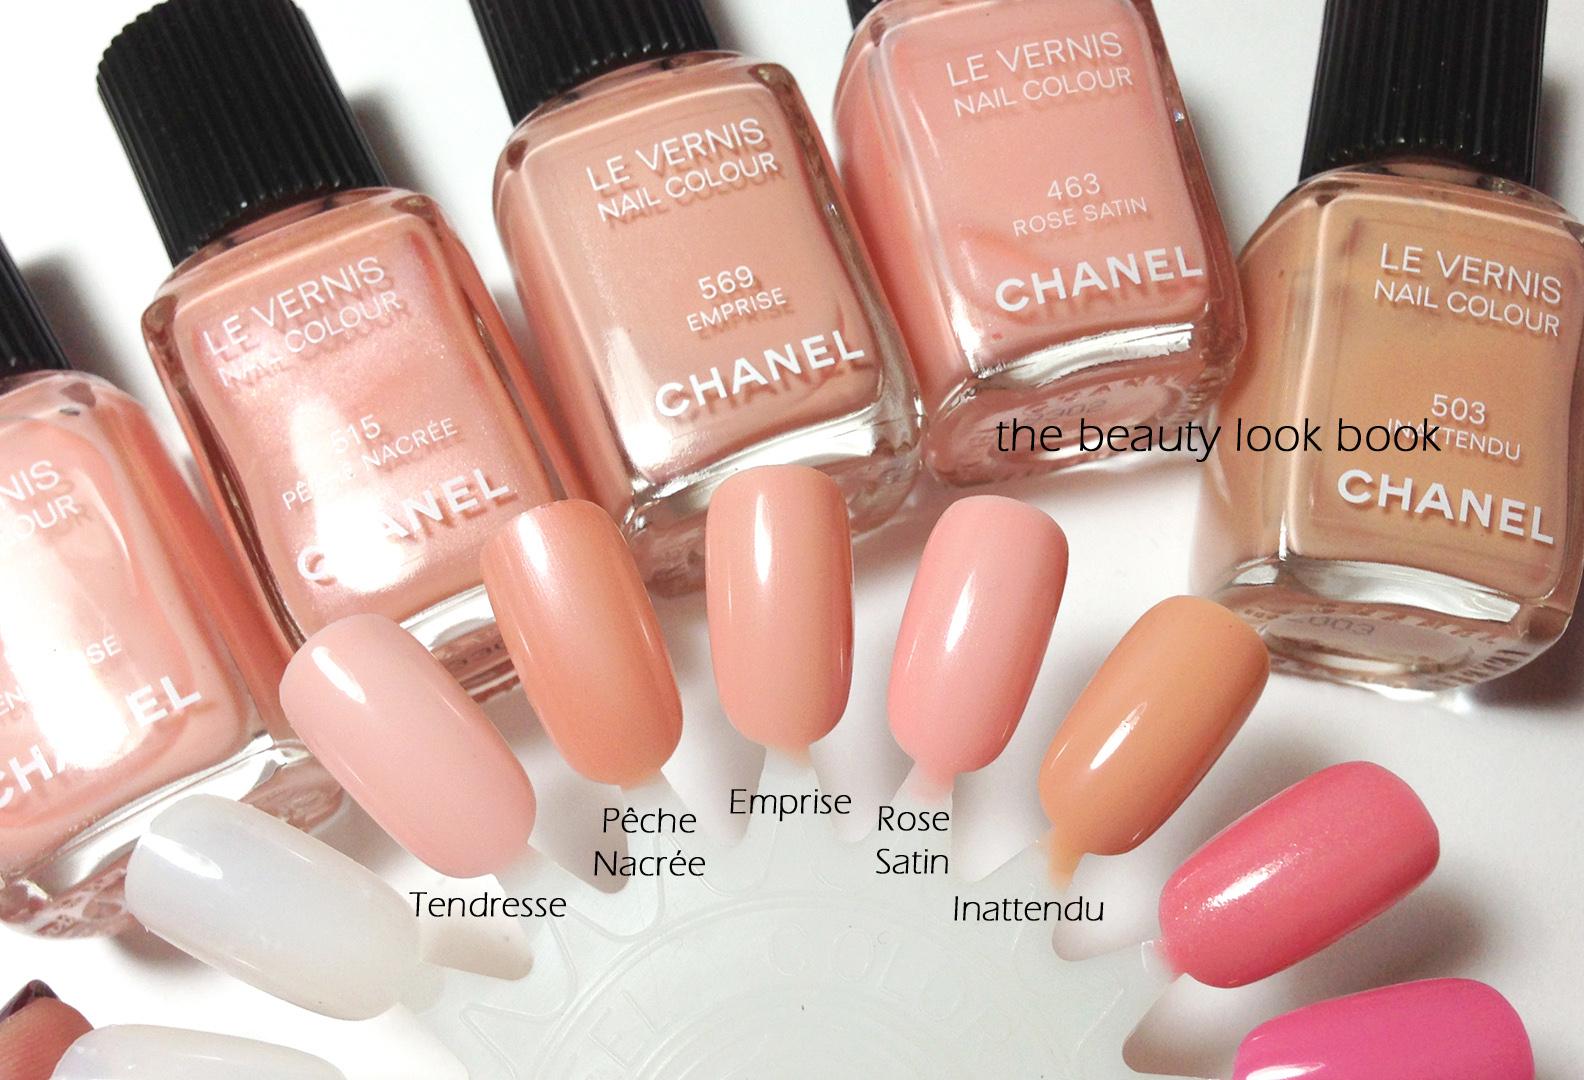 Comparisons For Chanel Emprise Fracas And Accessoire Le Vernis The Beauty Look Book